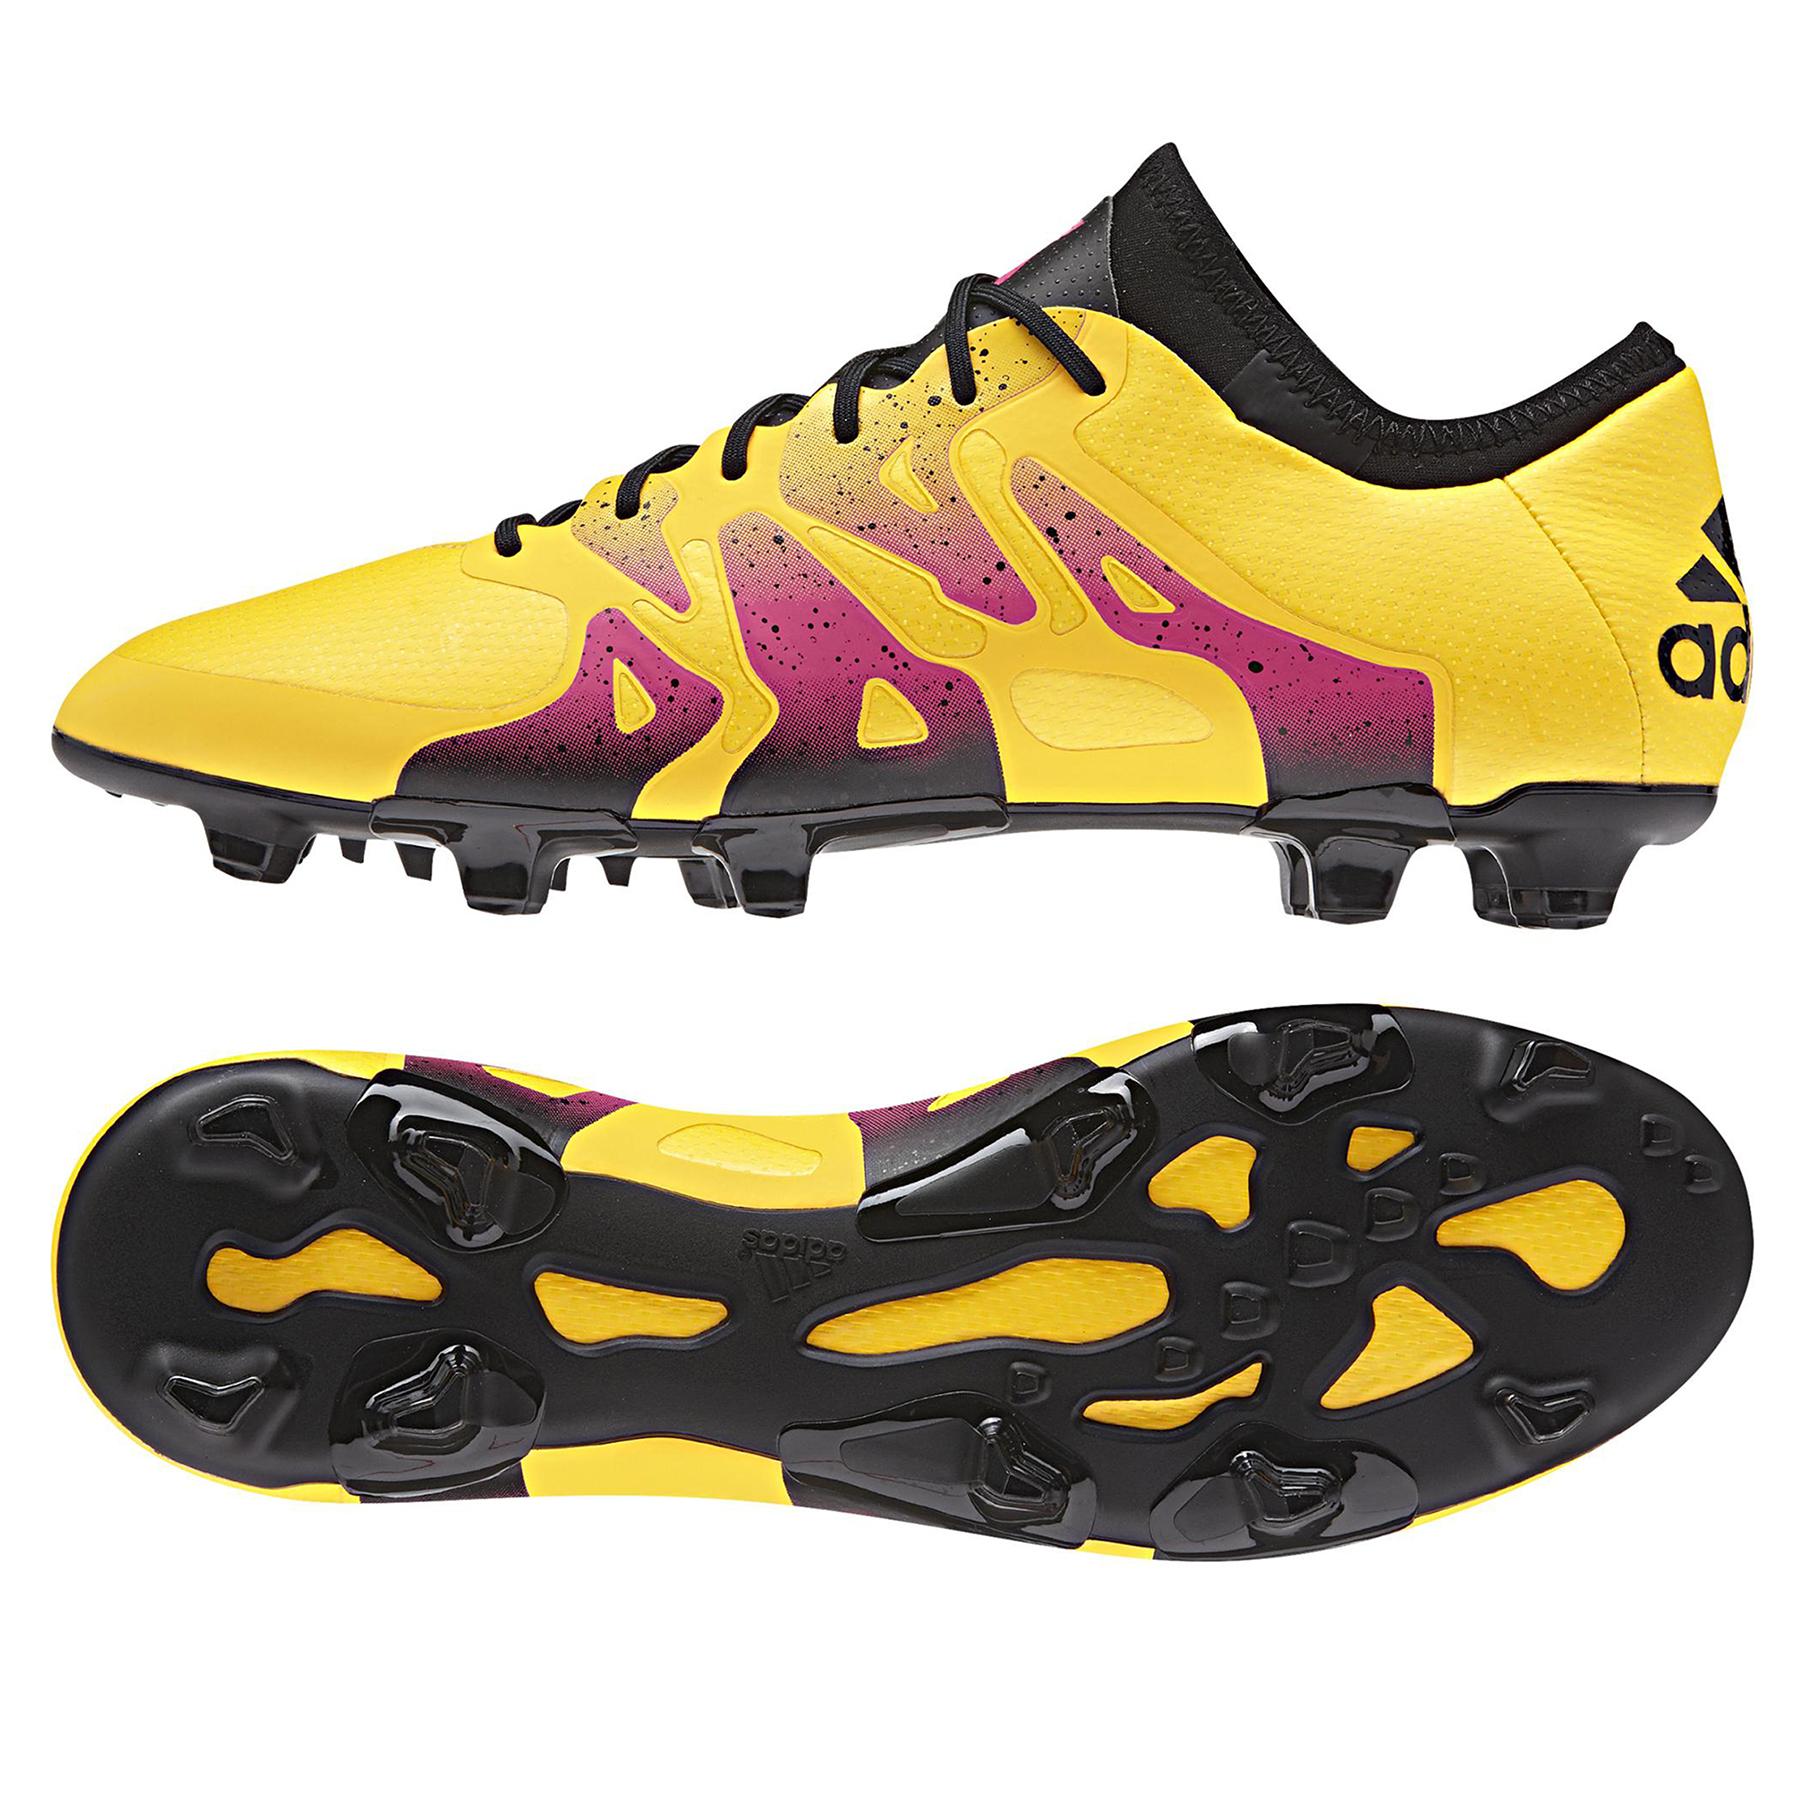 adidas X 15.1 Firm Ground Football Boots  Gold